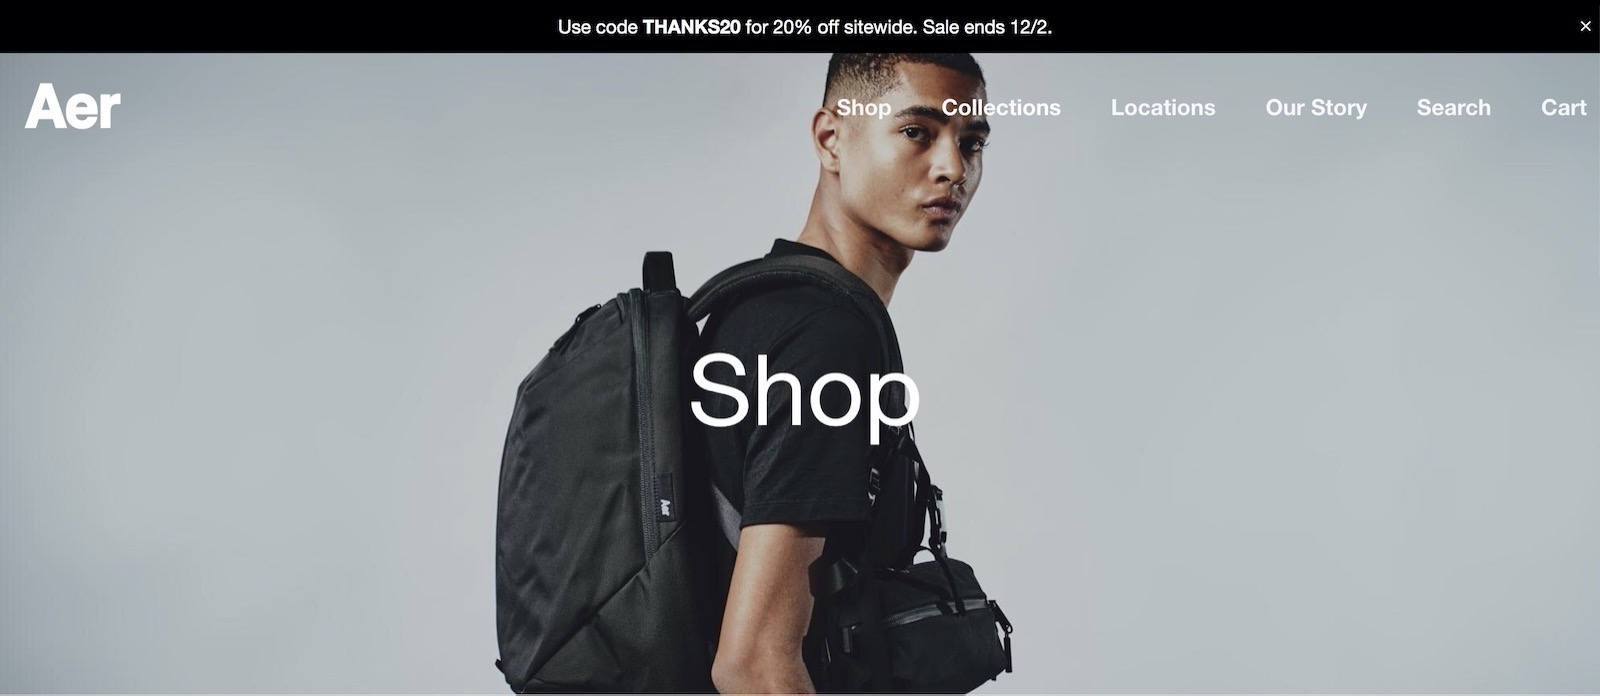 Aer-Backpack-Sale.jpg